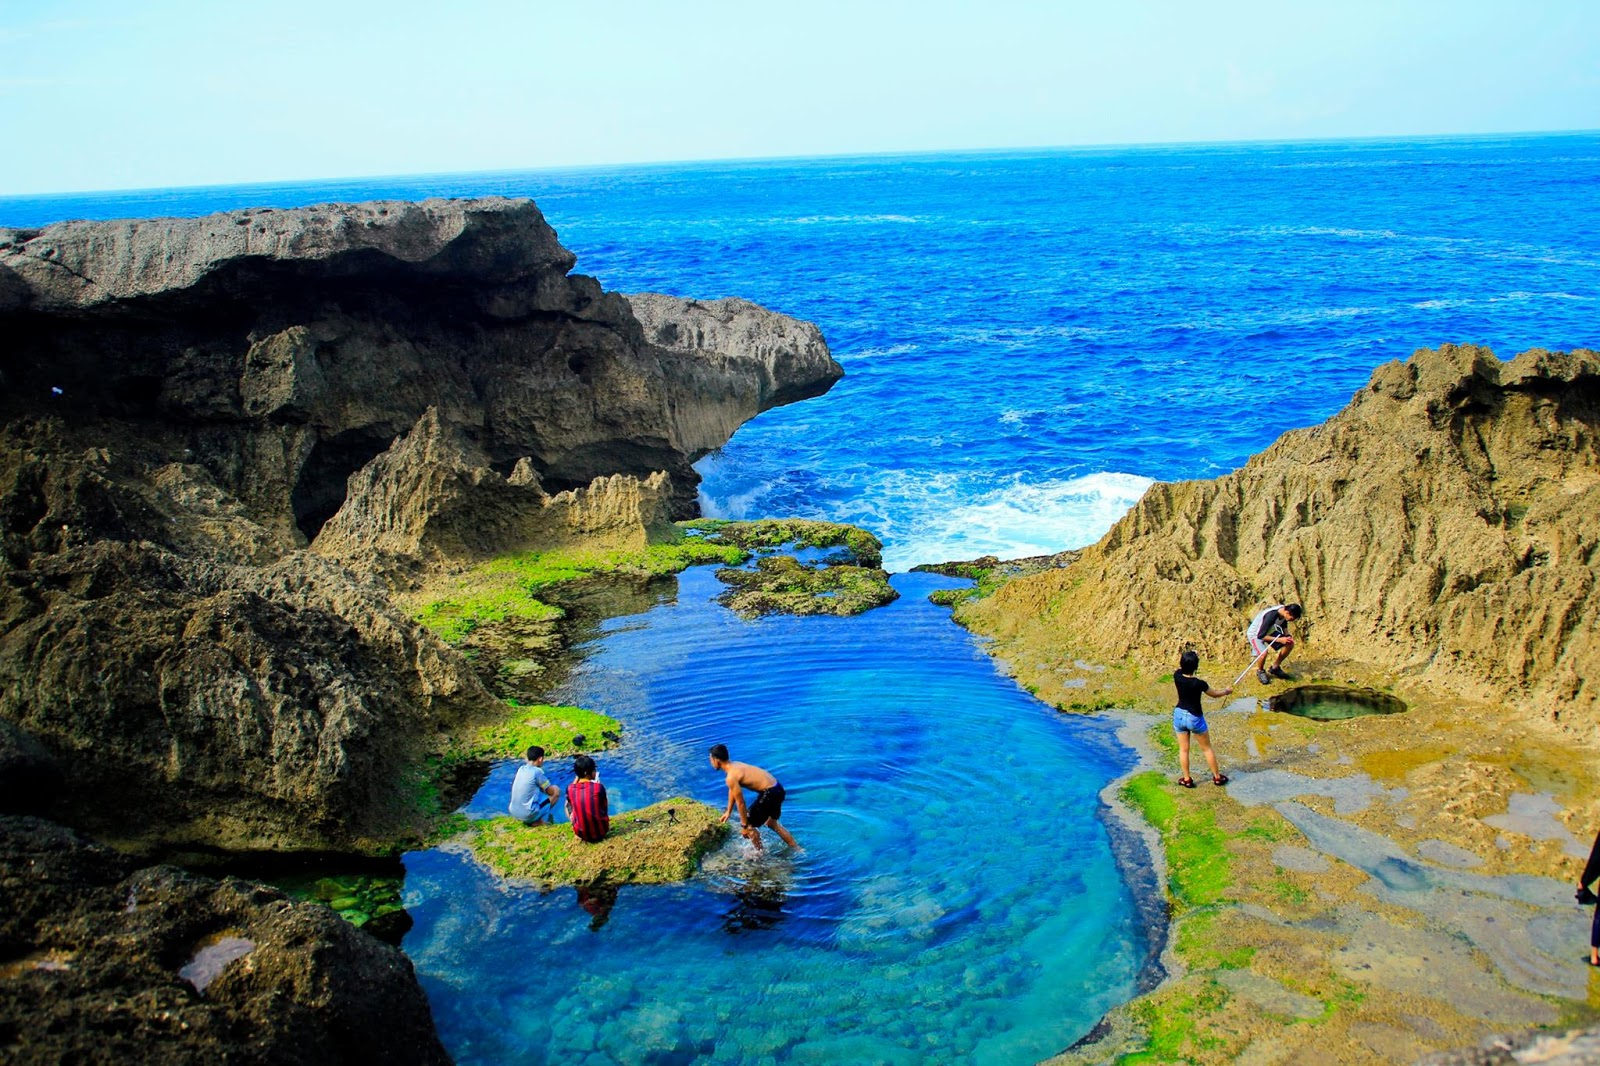 Bukan Malang Jawa Timur Punya Tulungagung Kamu Singgahi Taman Air